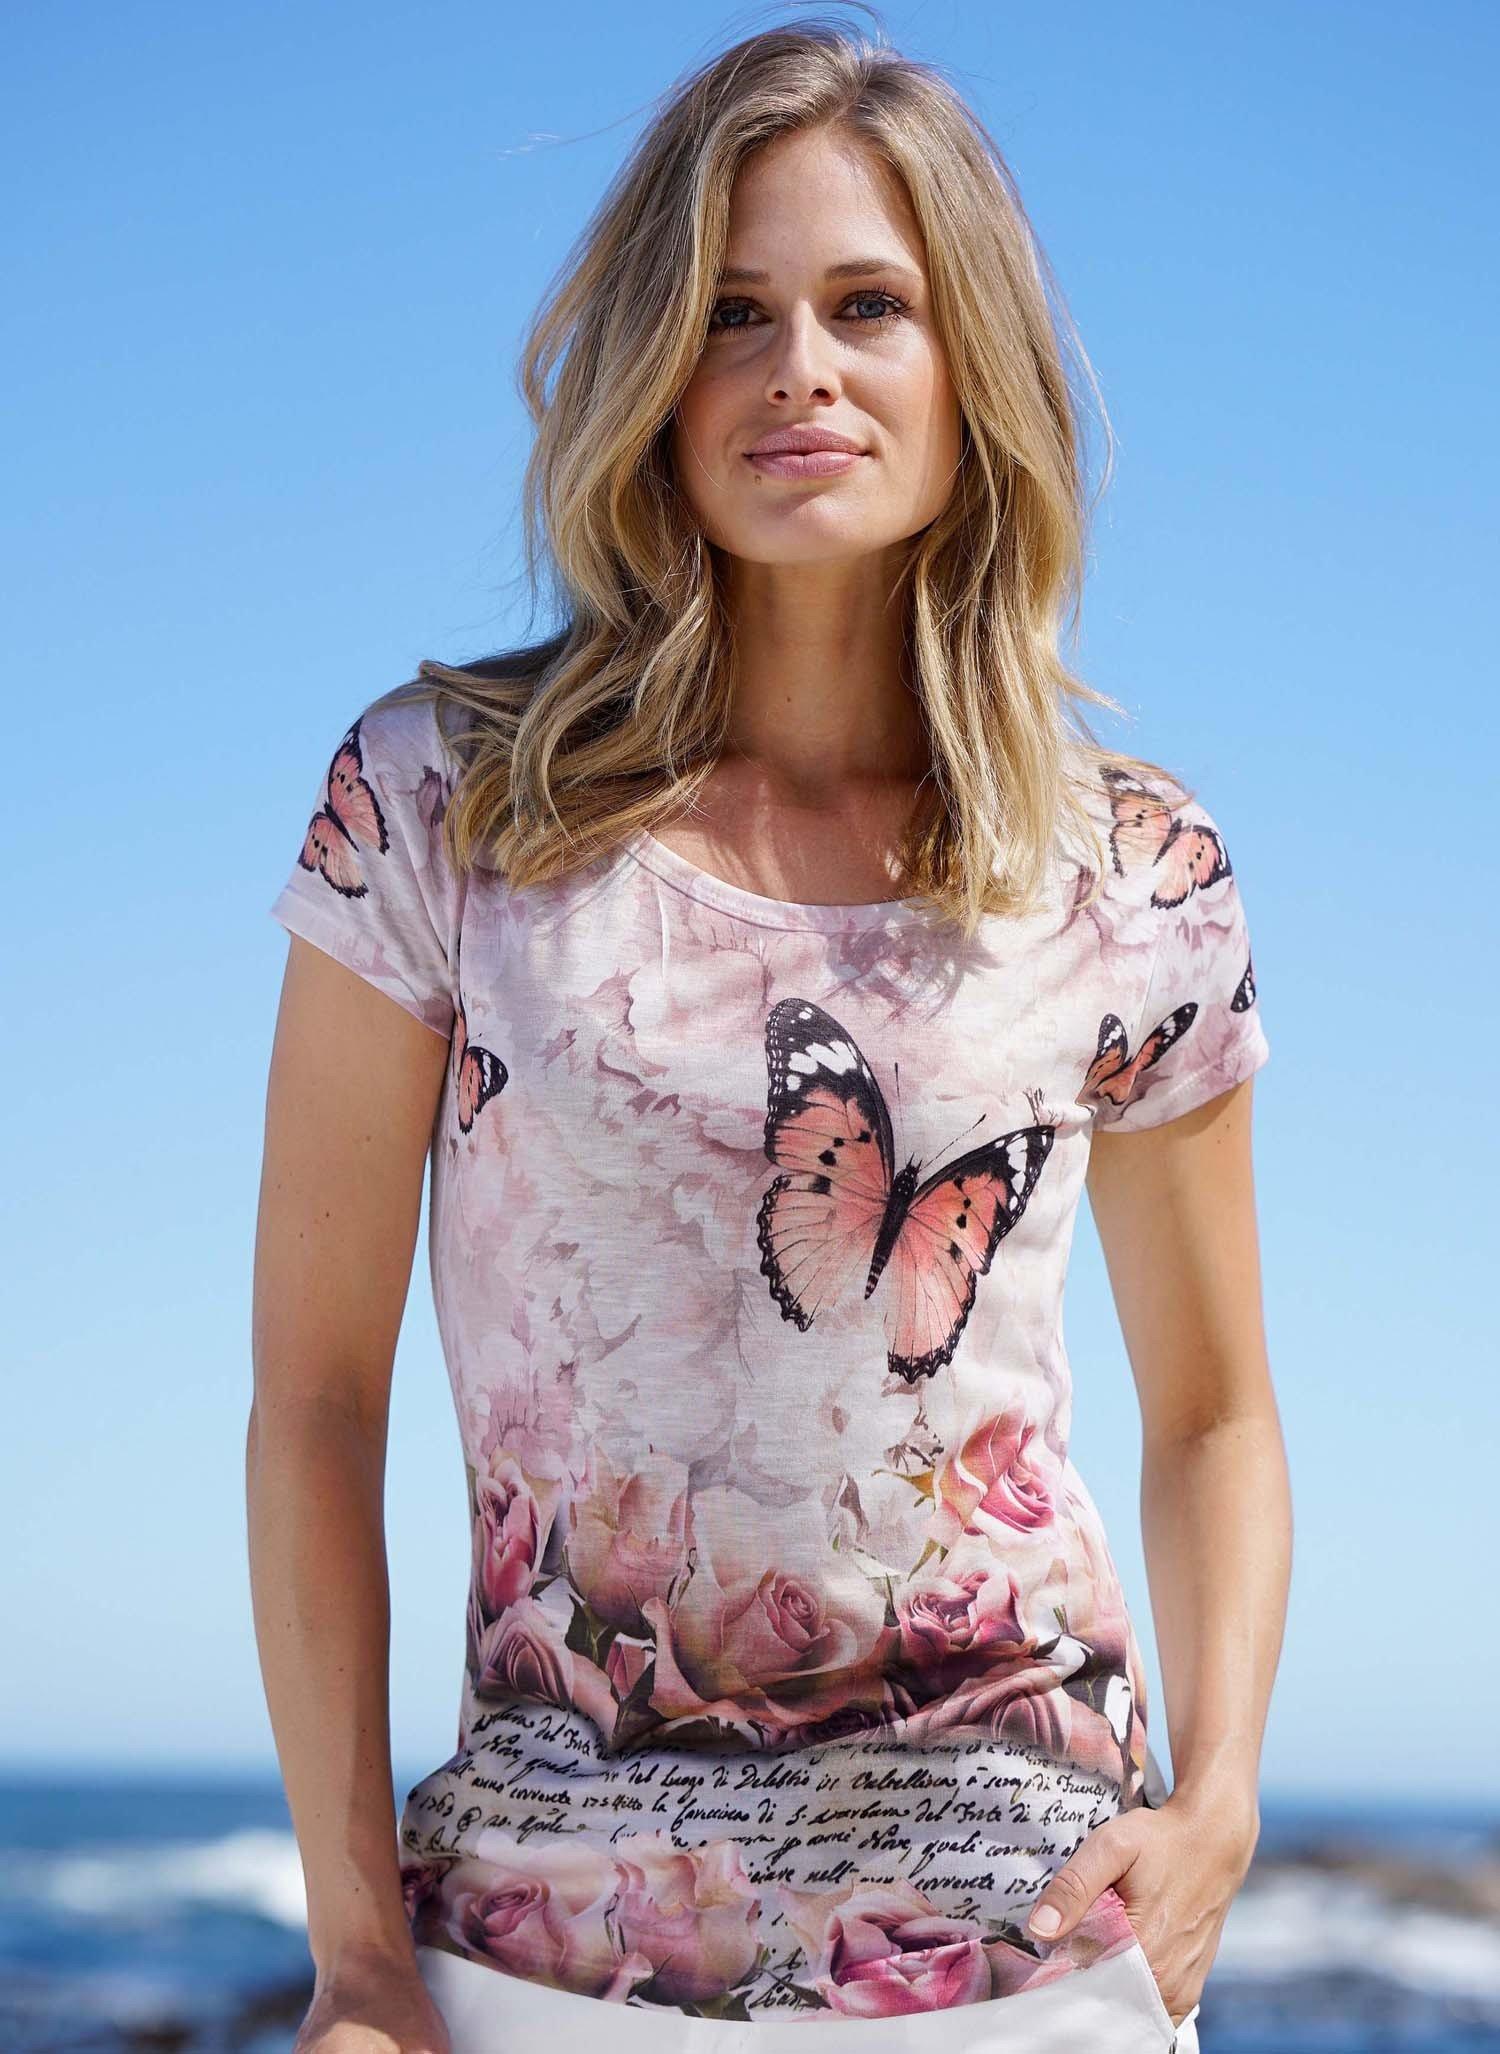 D-KA-Shirt,Schmetterling beige L 008 - 1 - Ronja.ch